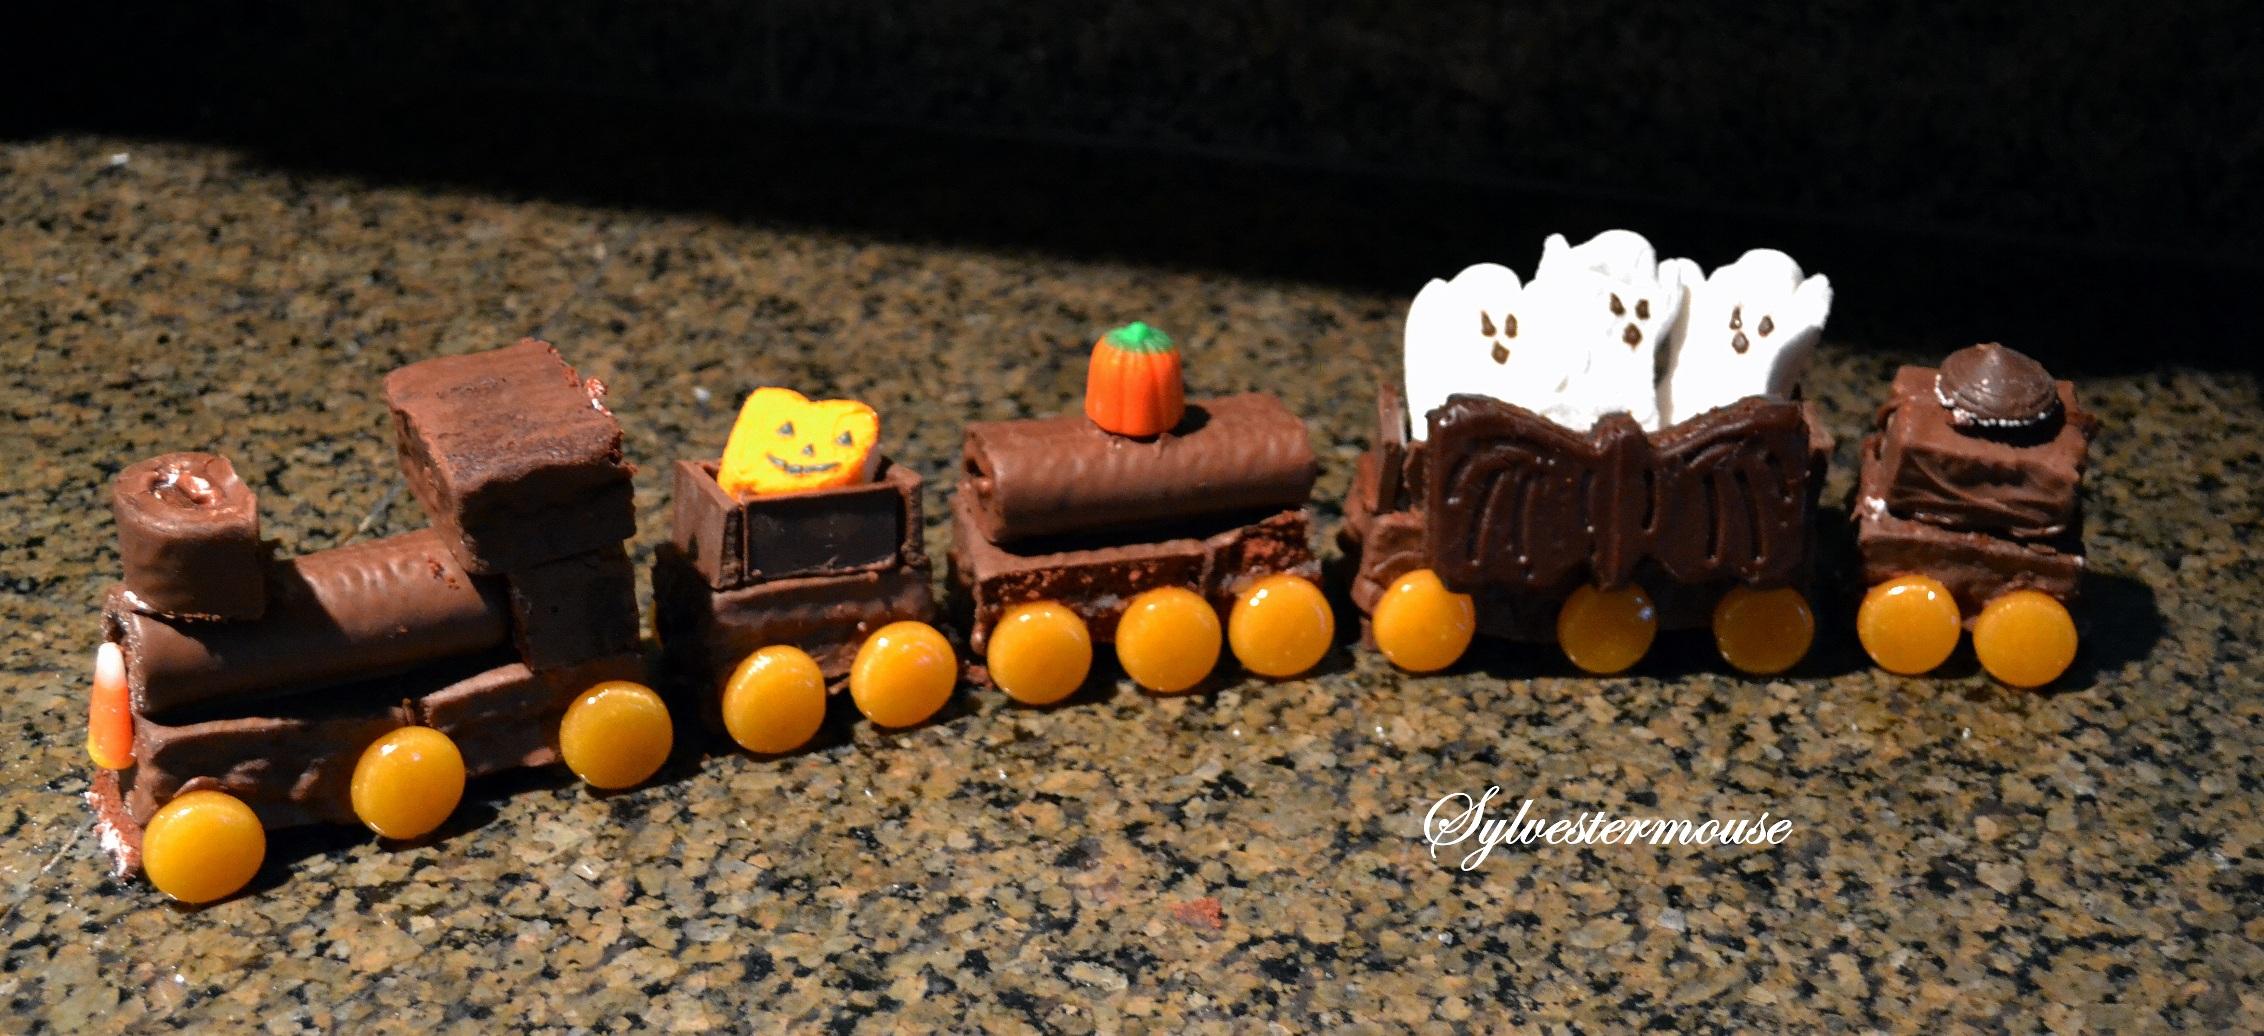 Make a cake train